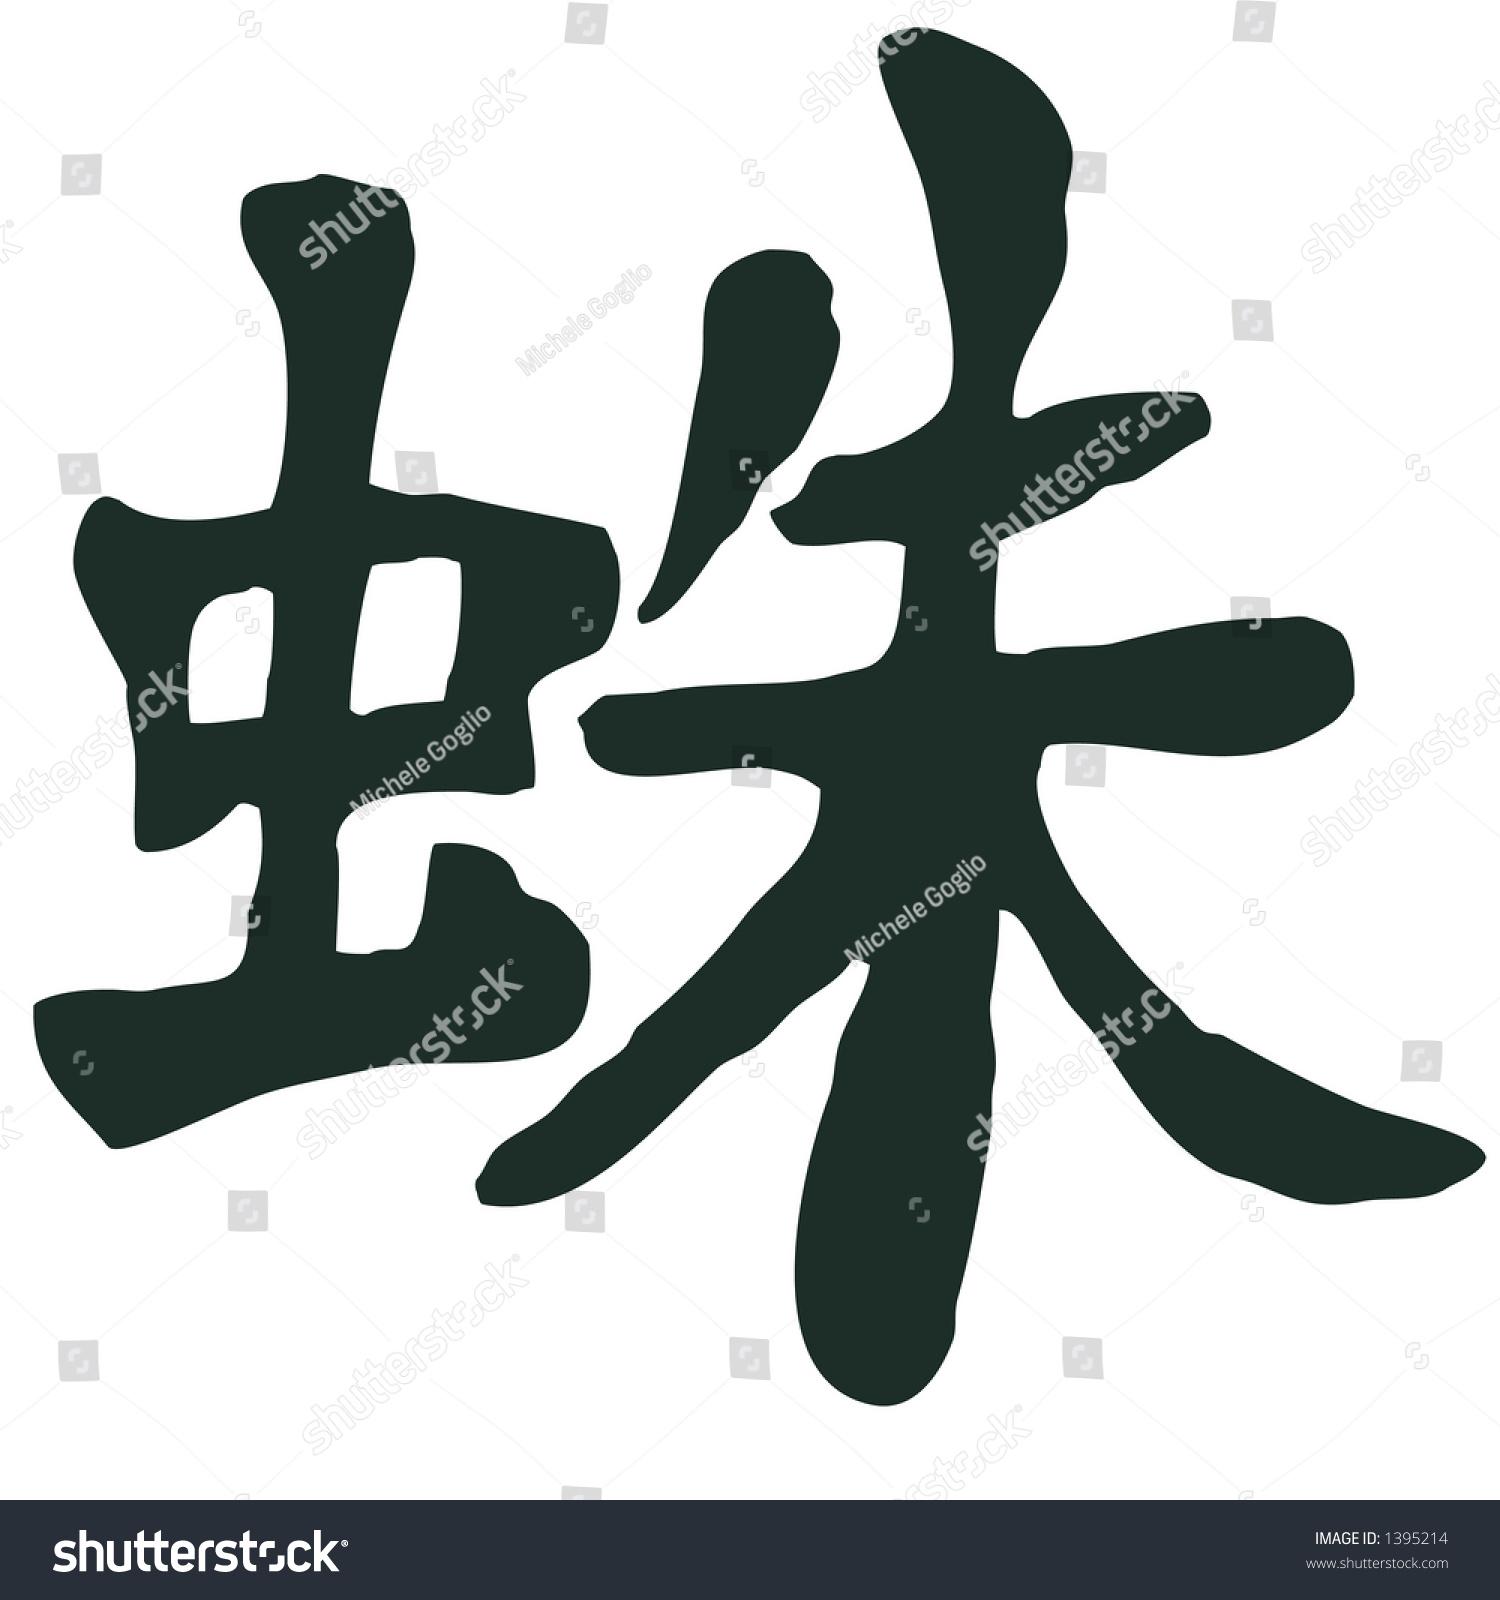 symbole japonais d 39 araignee stock photo 1395214 shutterstock. Black Bedroom Furniture Sets. Home Design Ideas